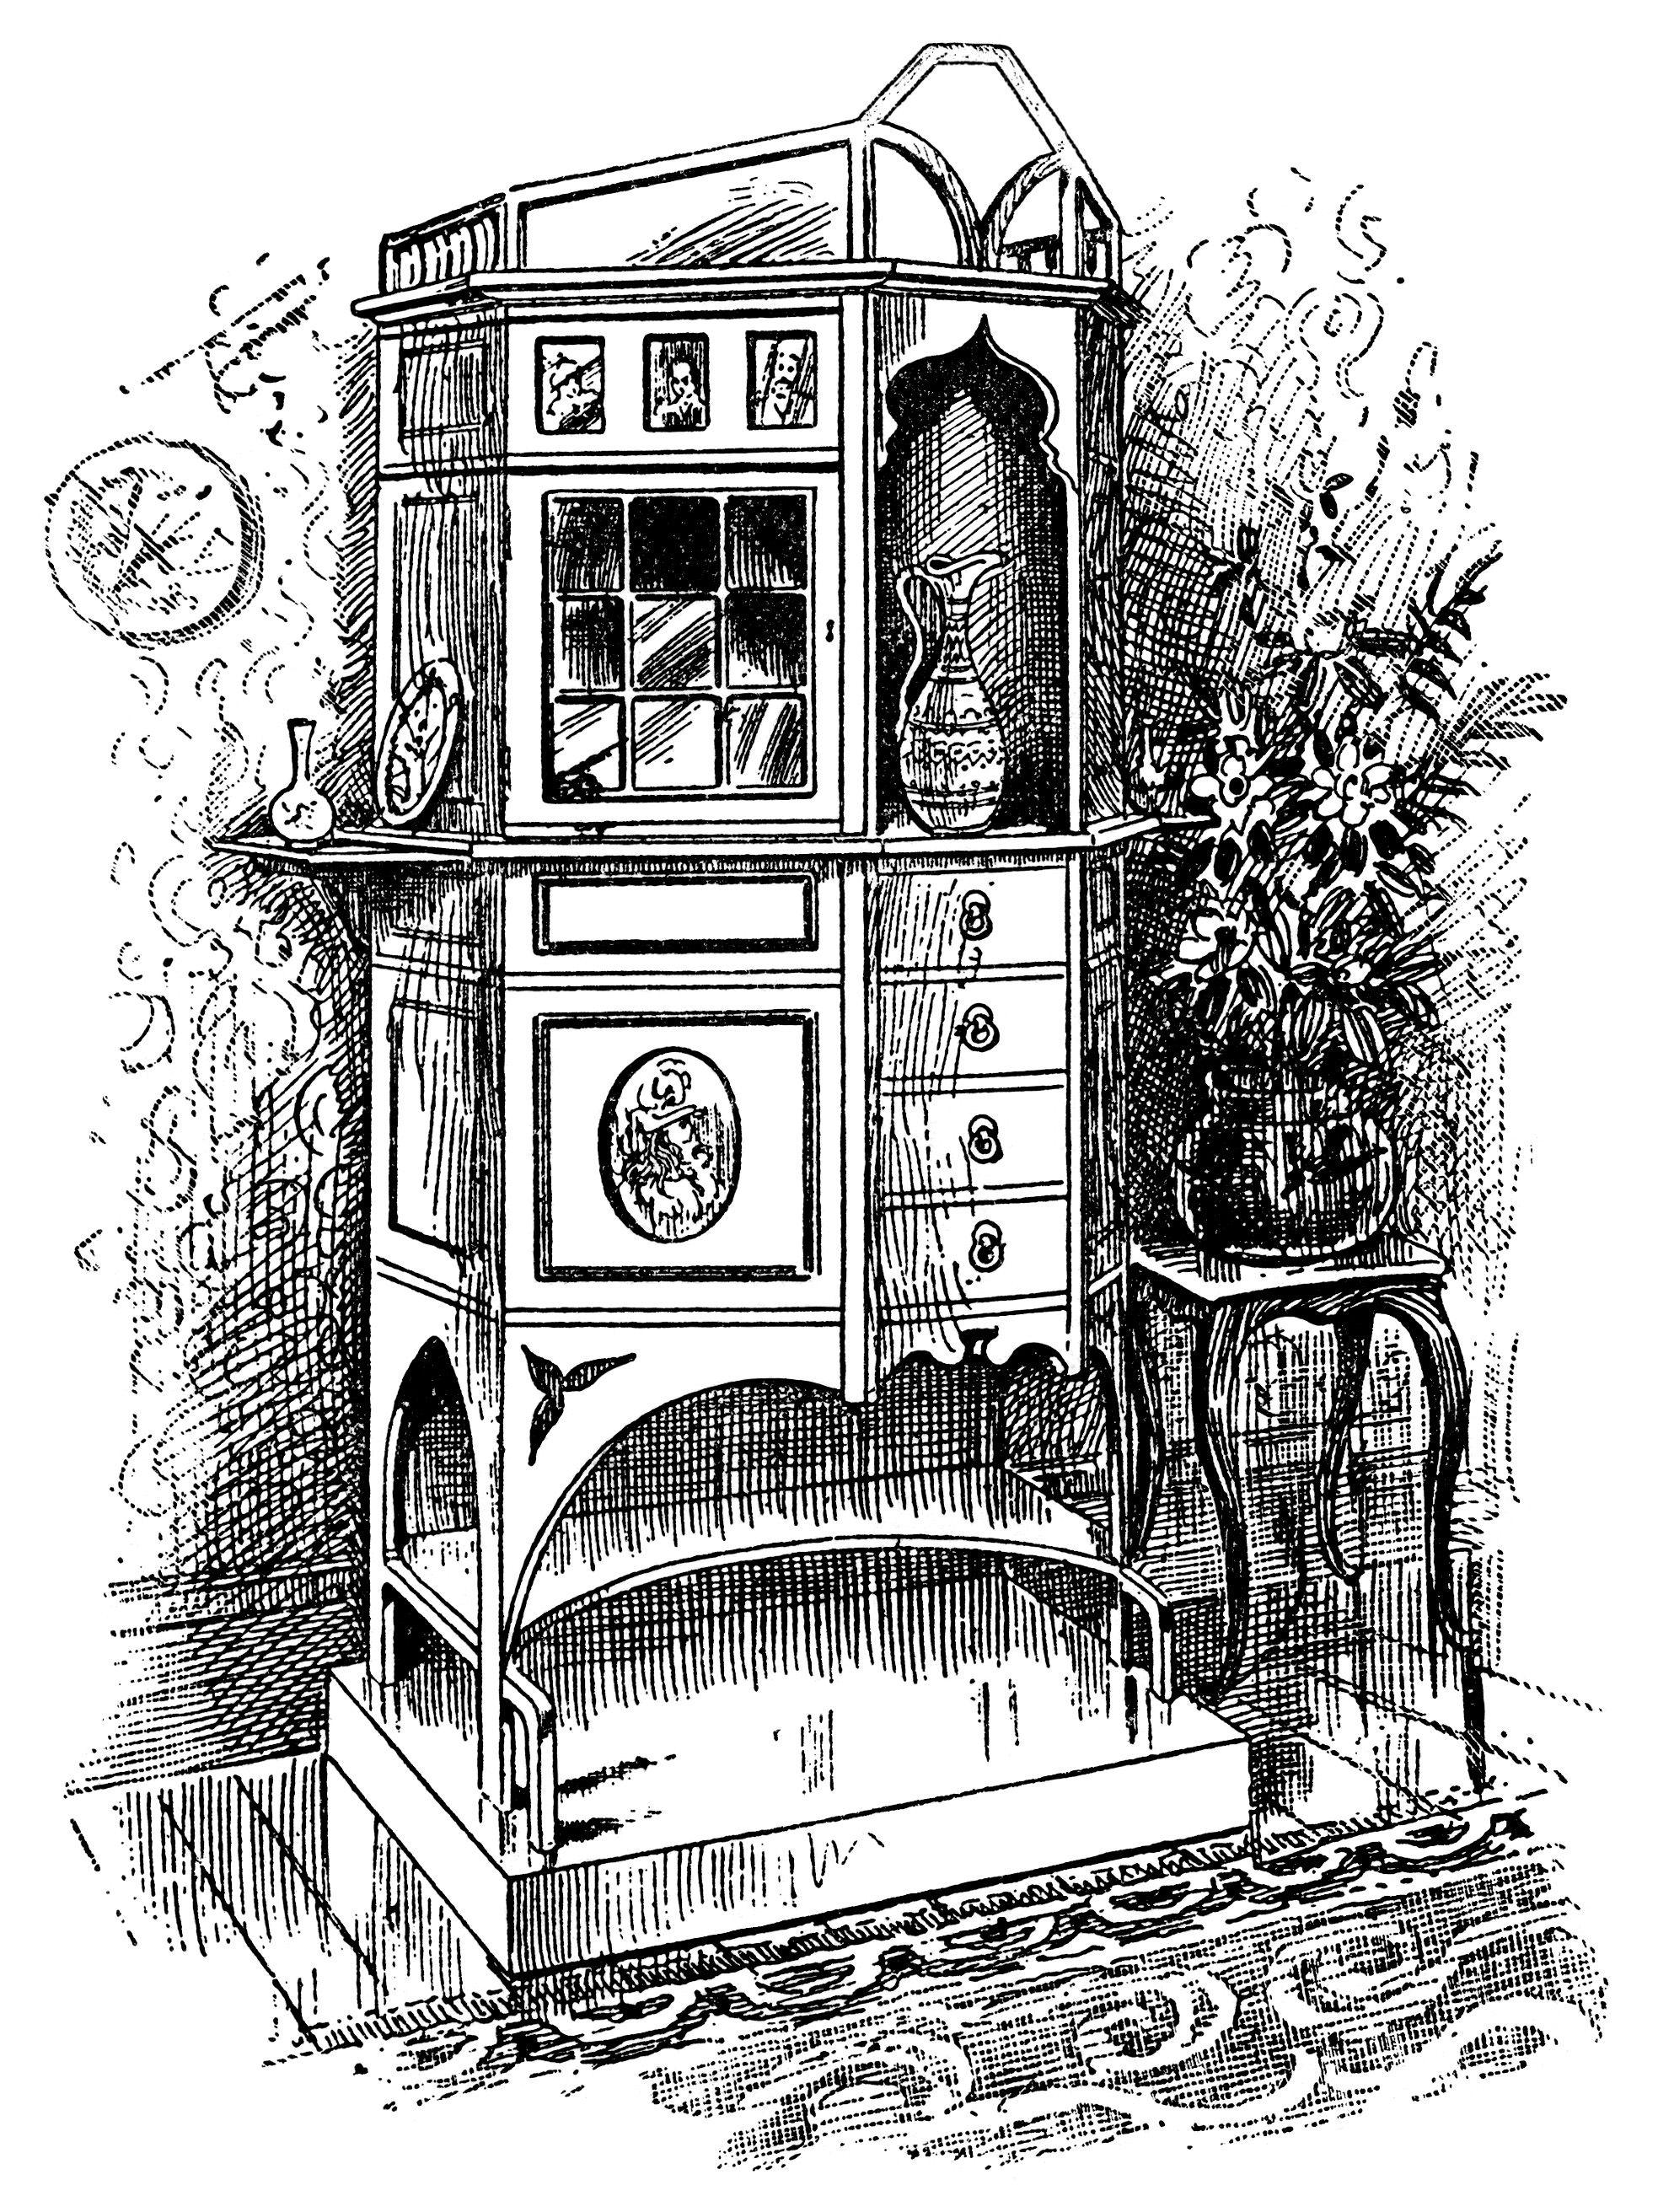 Victorian furniture illustration, black and white graphics, vintage.